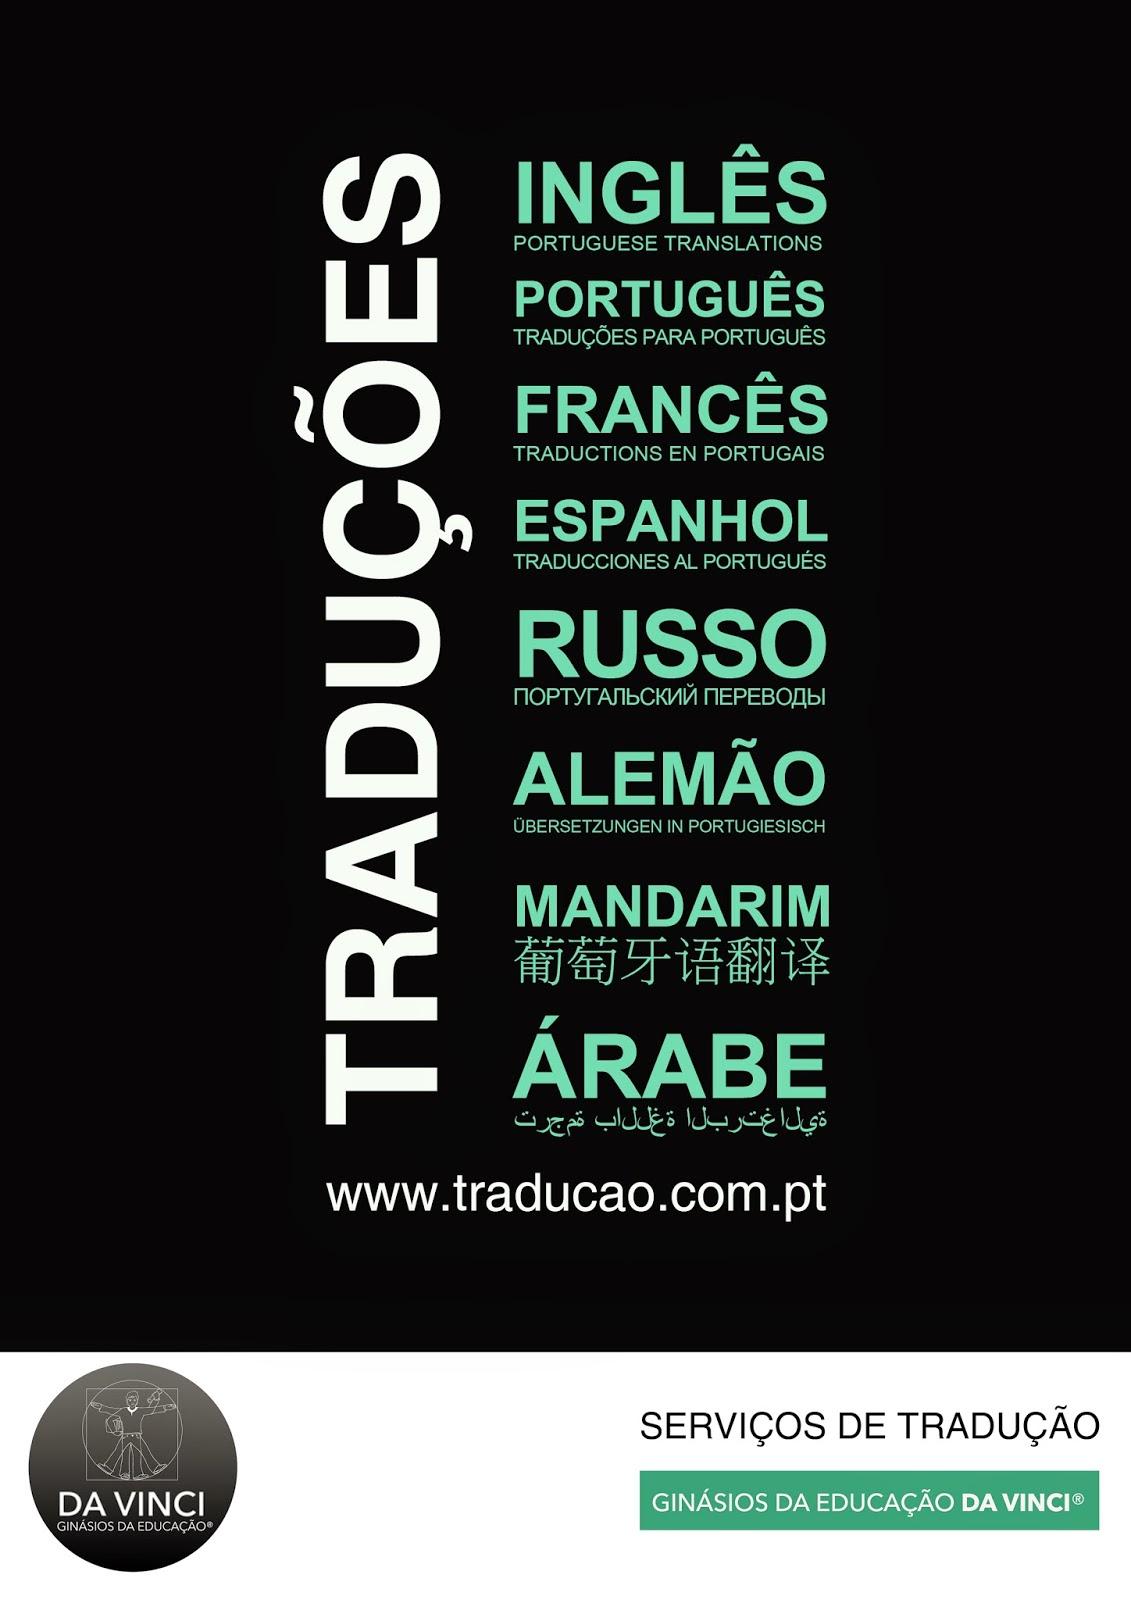 http://www.traducao.com.pt/